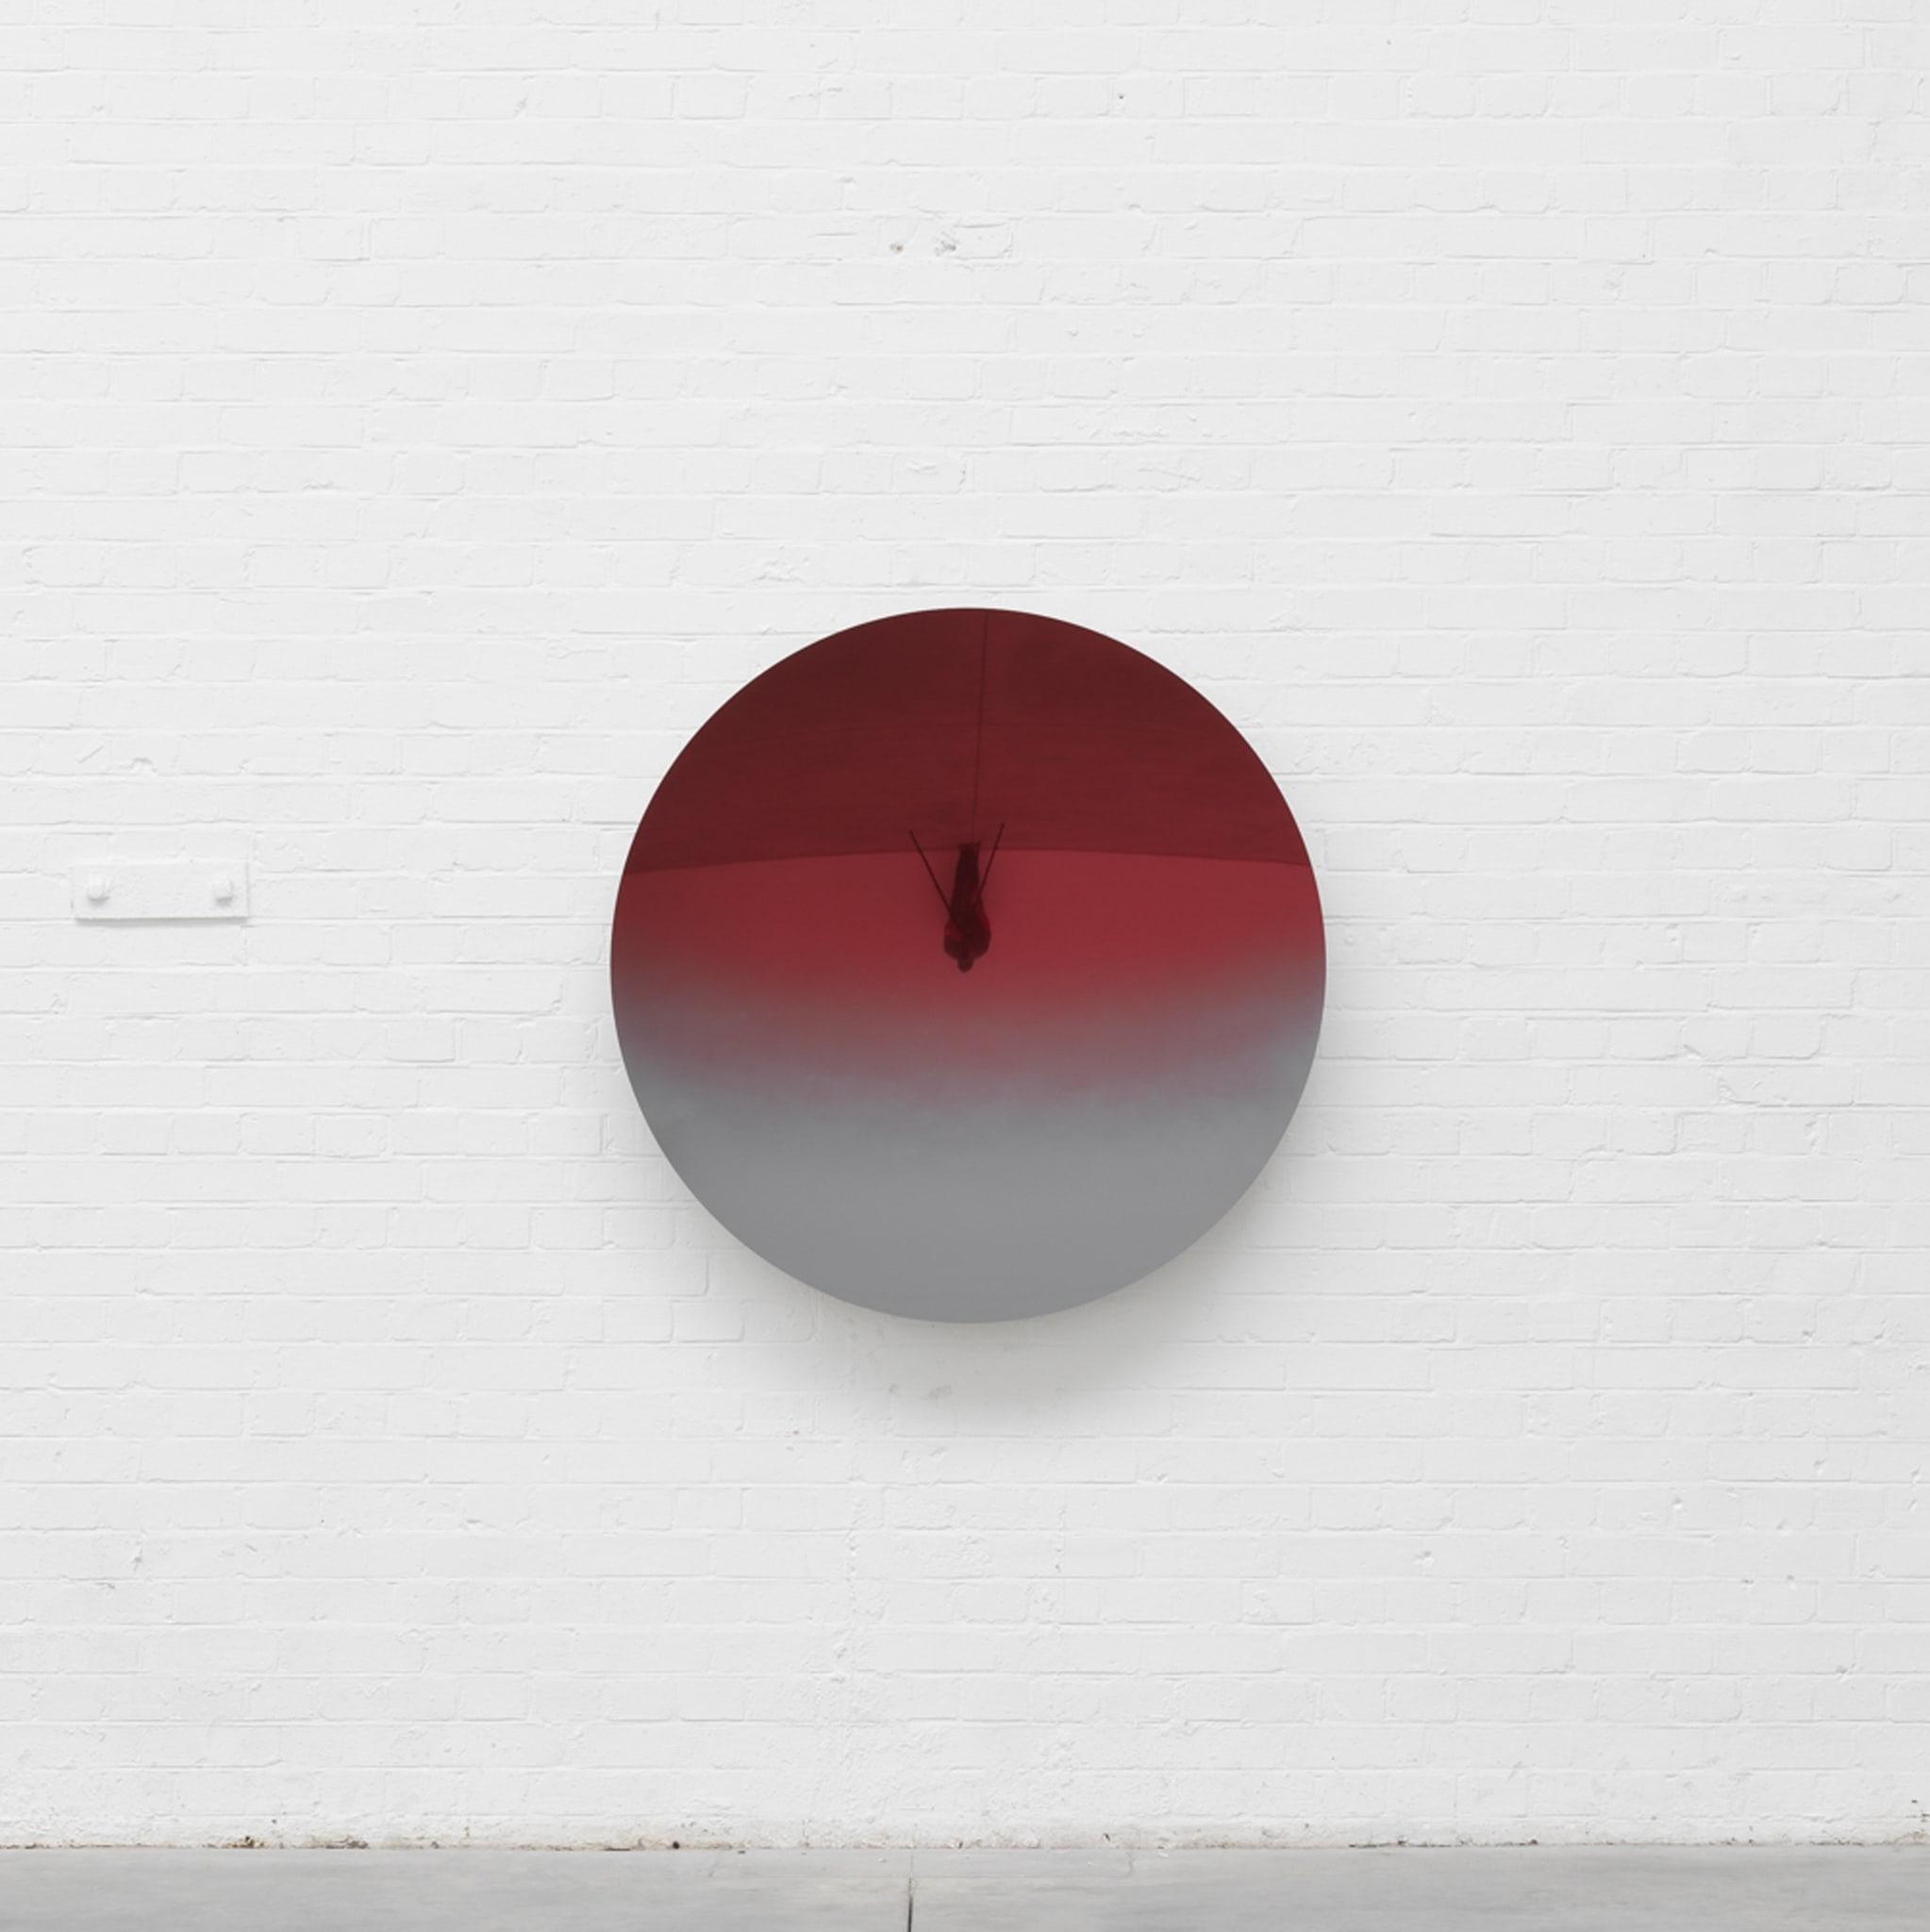 Mirror (Apple Magenta to Grey) by Anish Kapoor